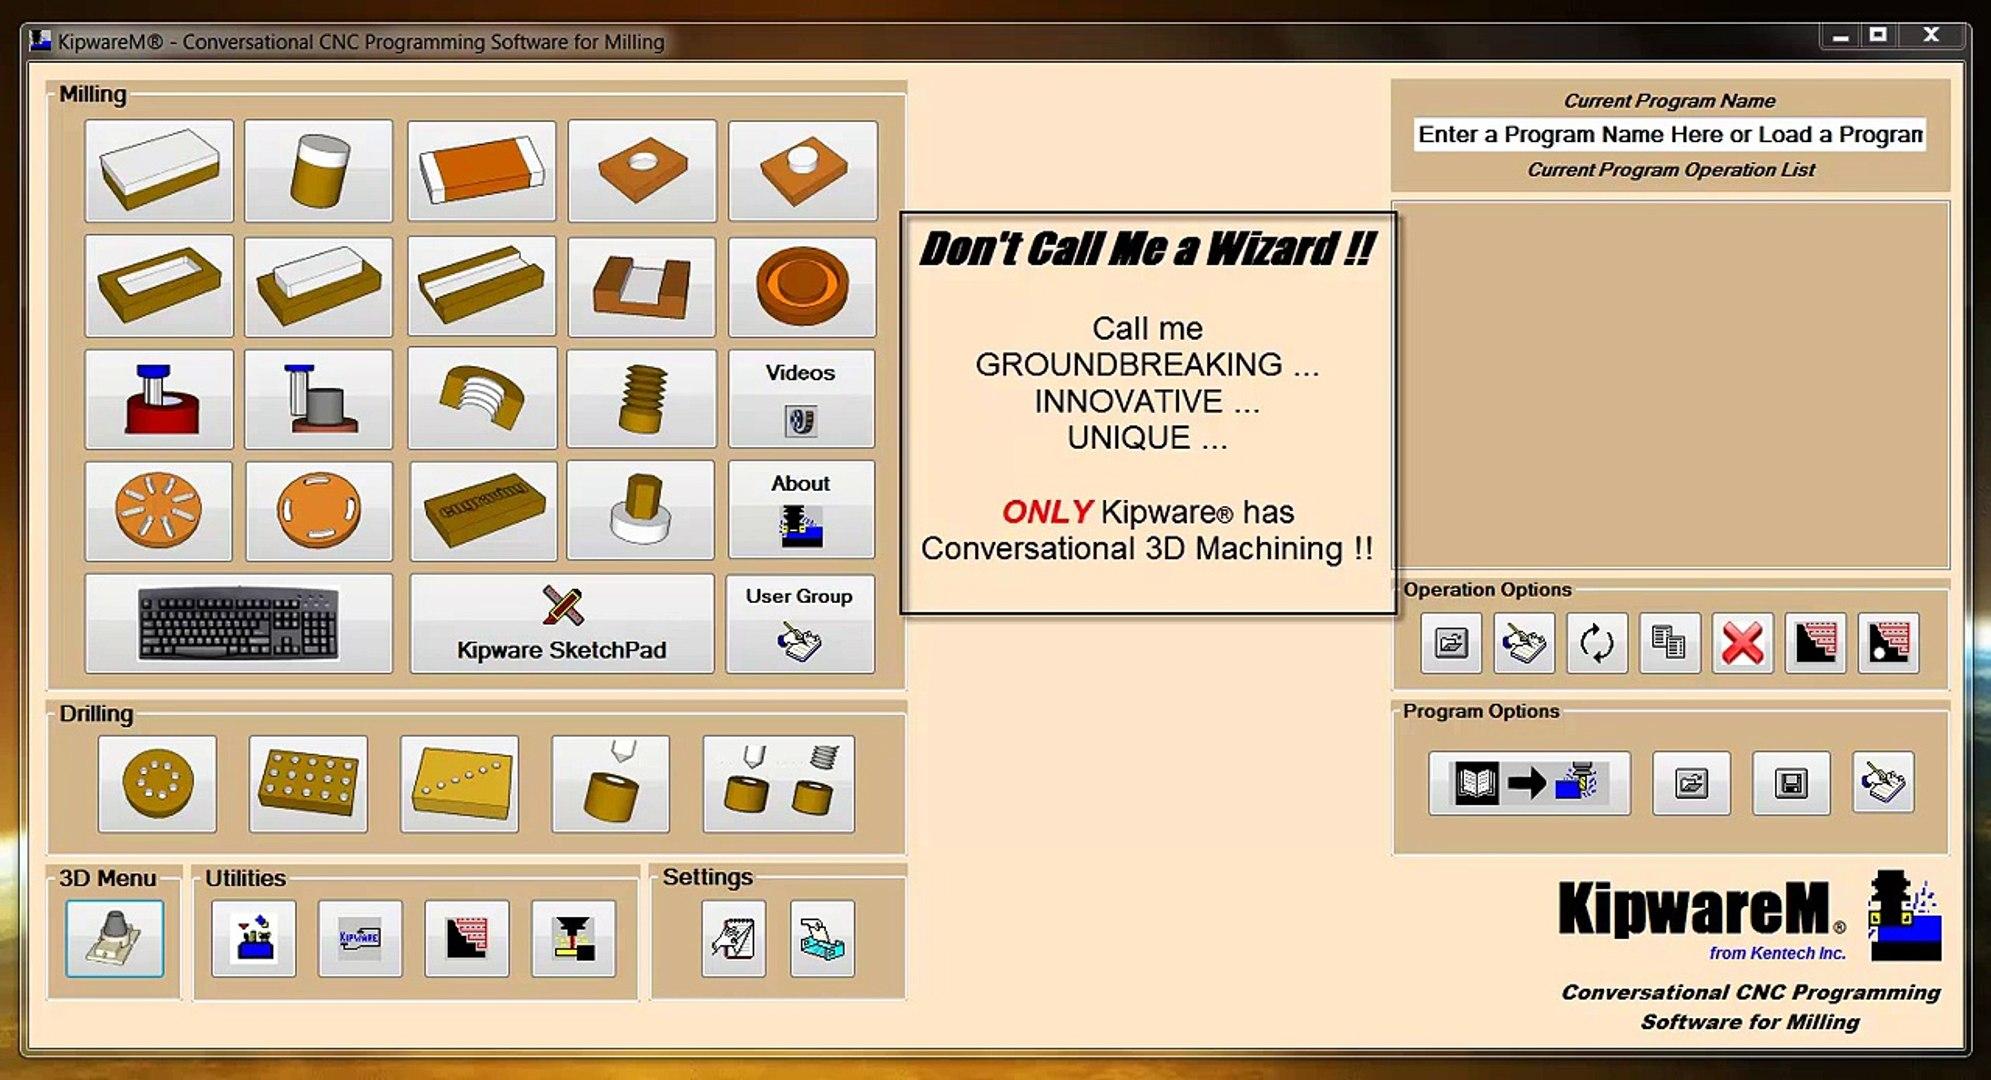 KipwareM® Conversational CNC Programming Software for 3D Machining